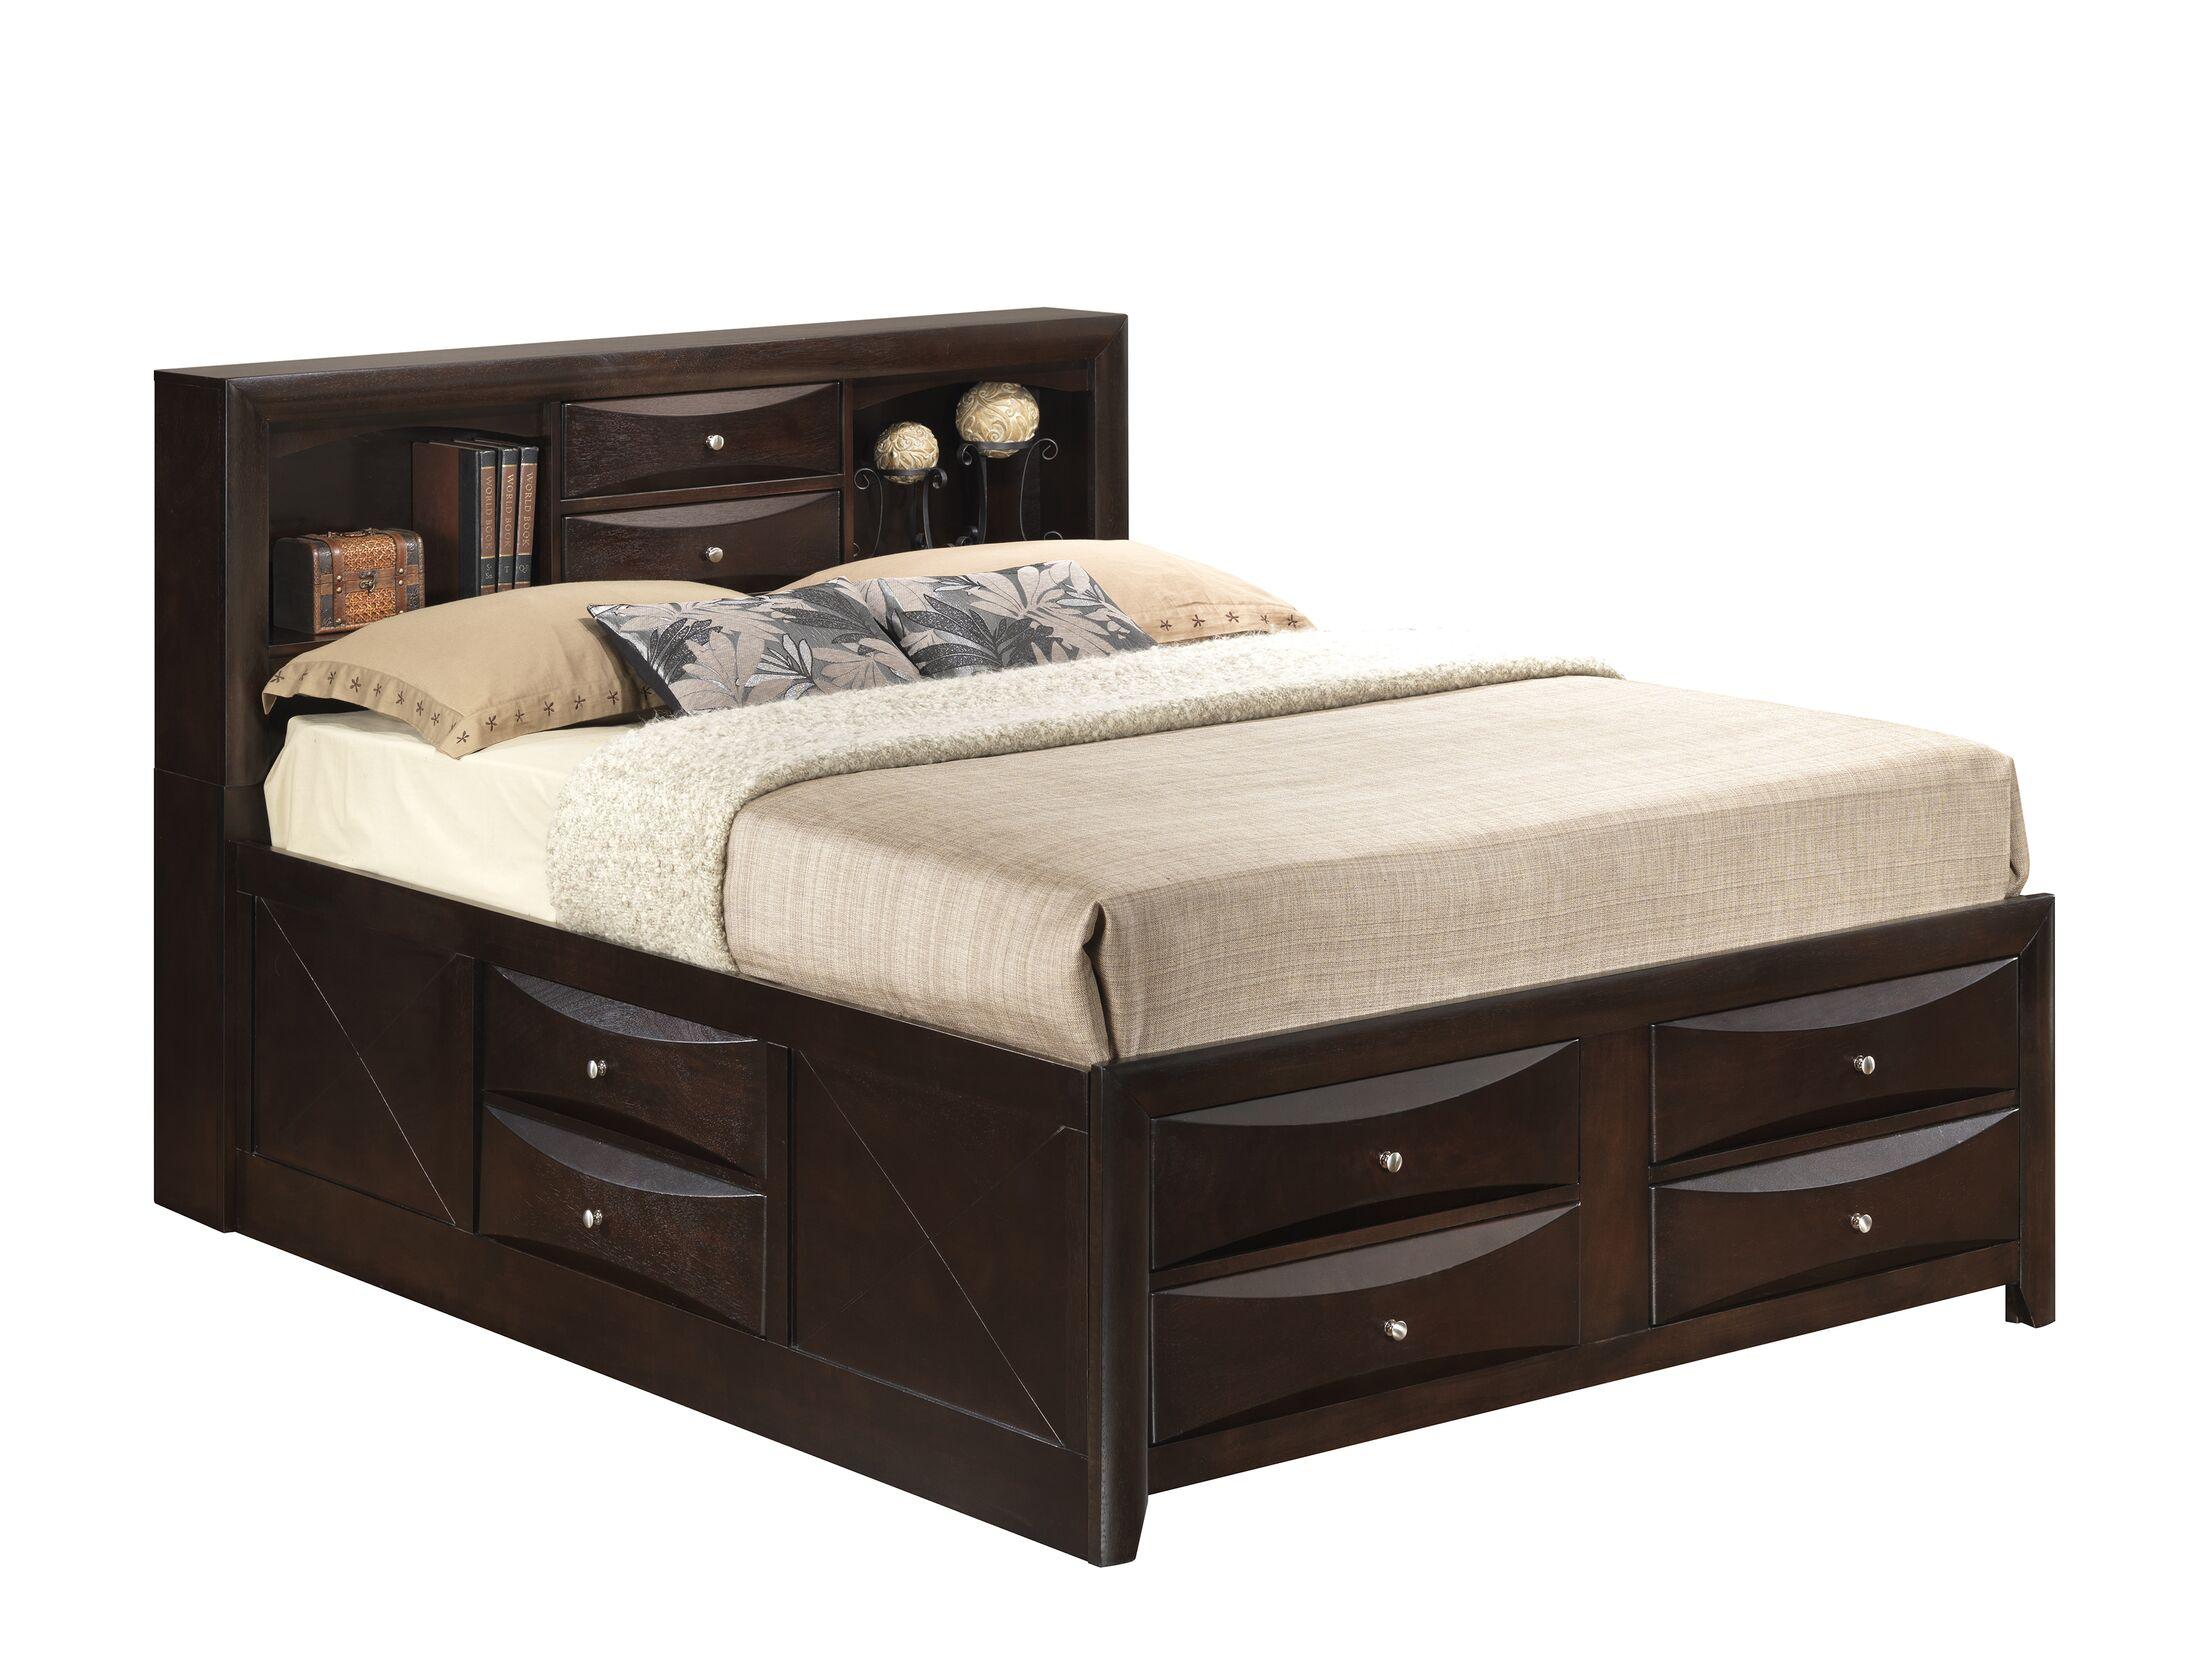 Medford Storage Platform Bed Size: Full, Color: Cappuccino